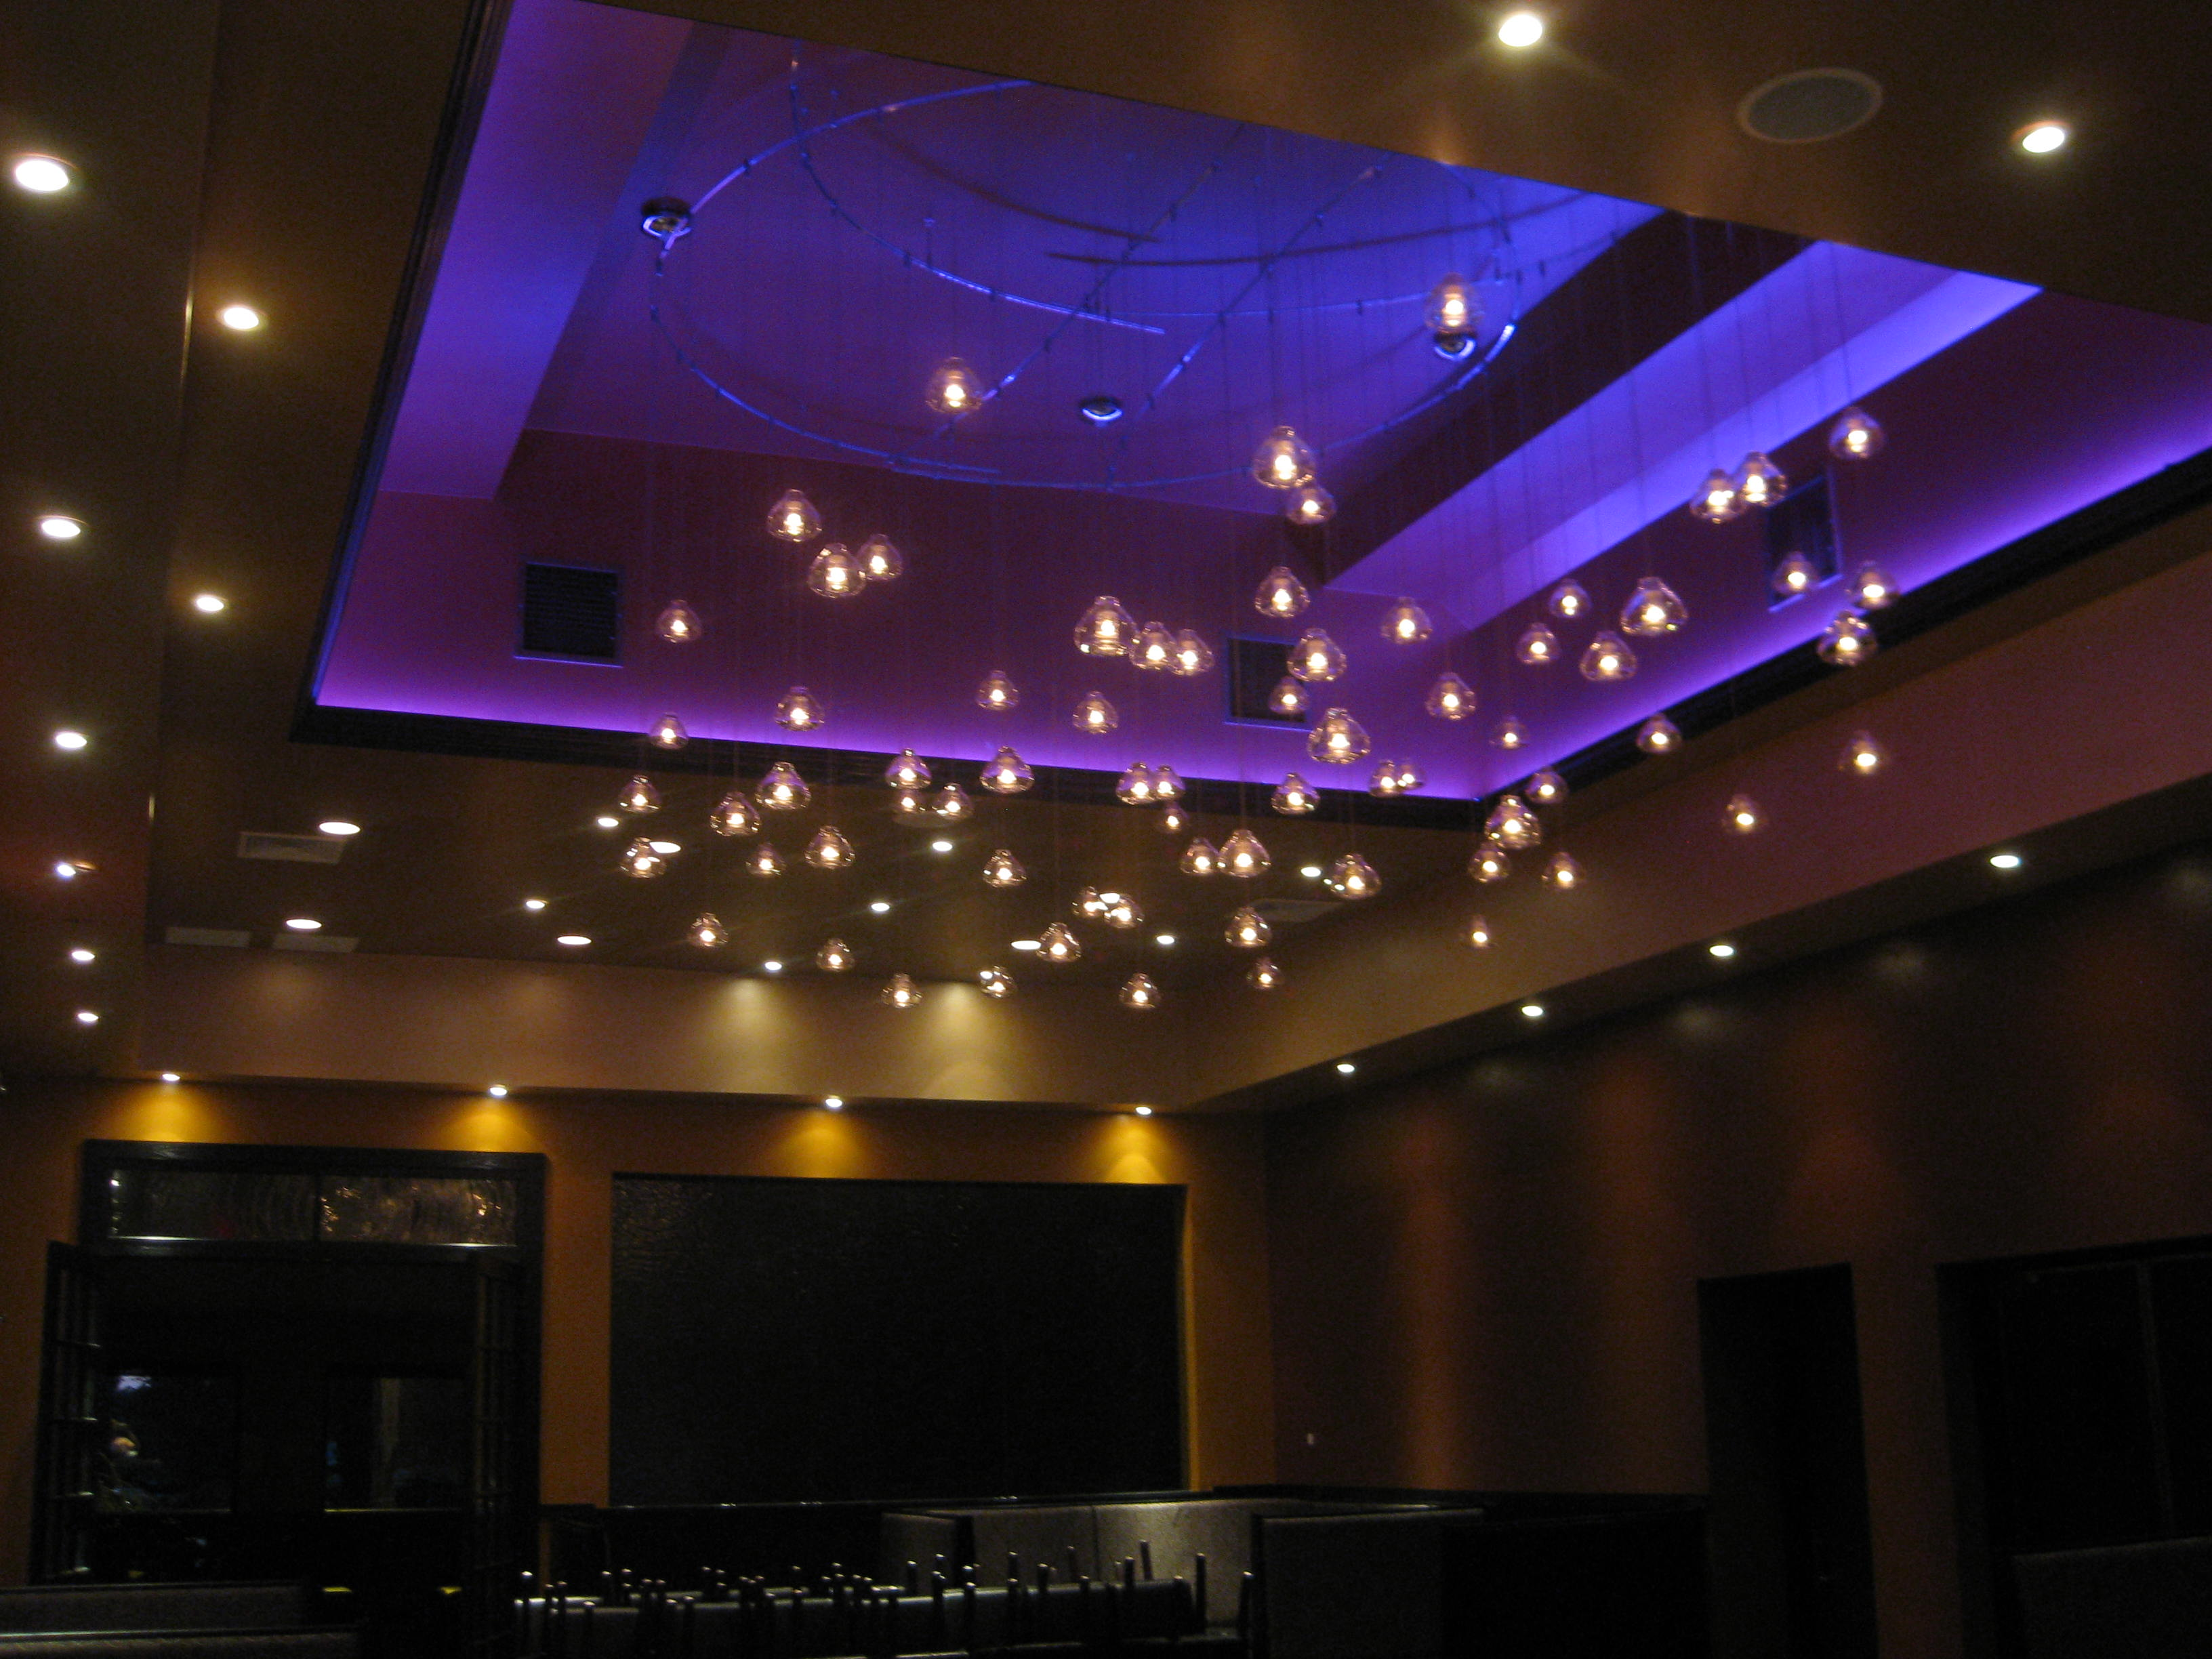 star led lights ceiling photo - 1